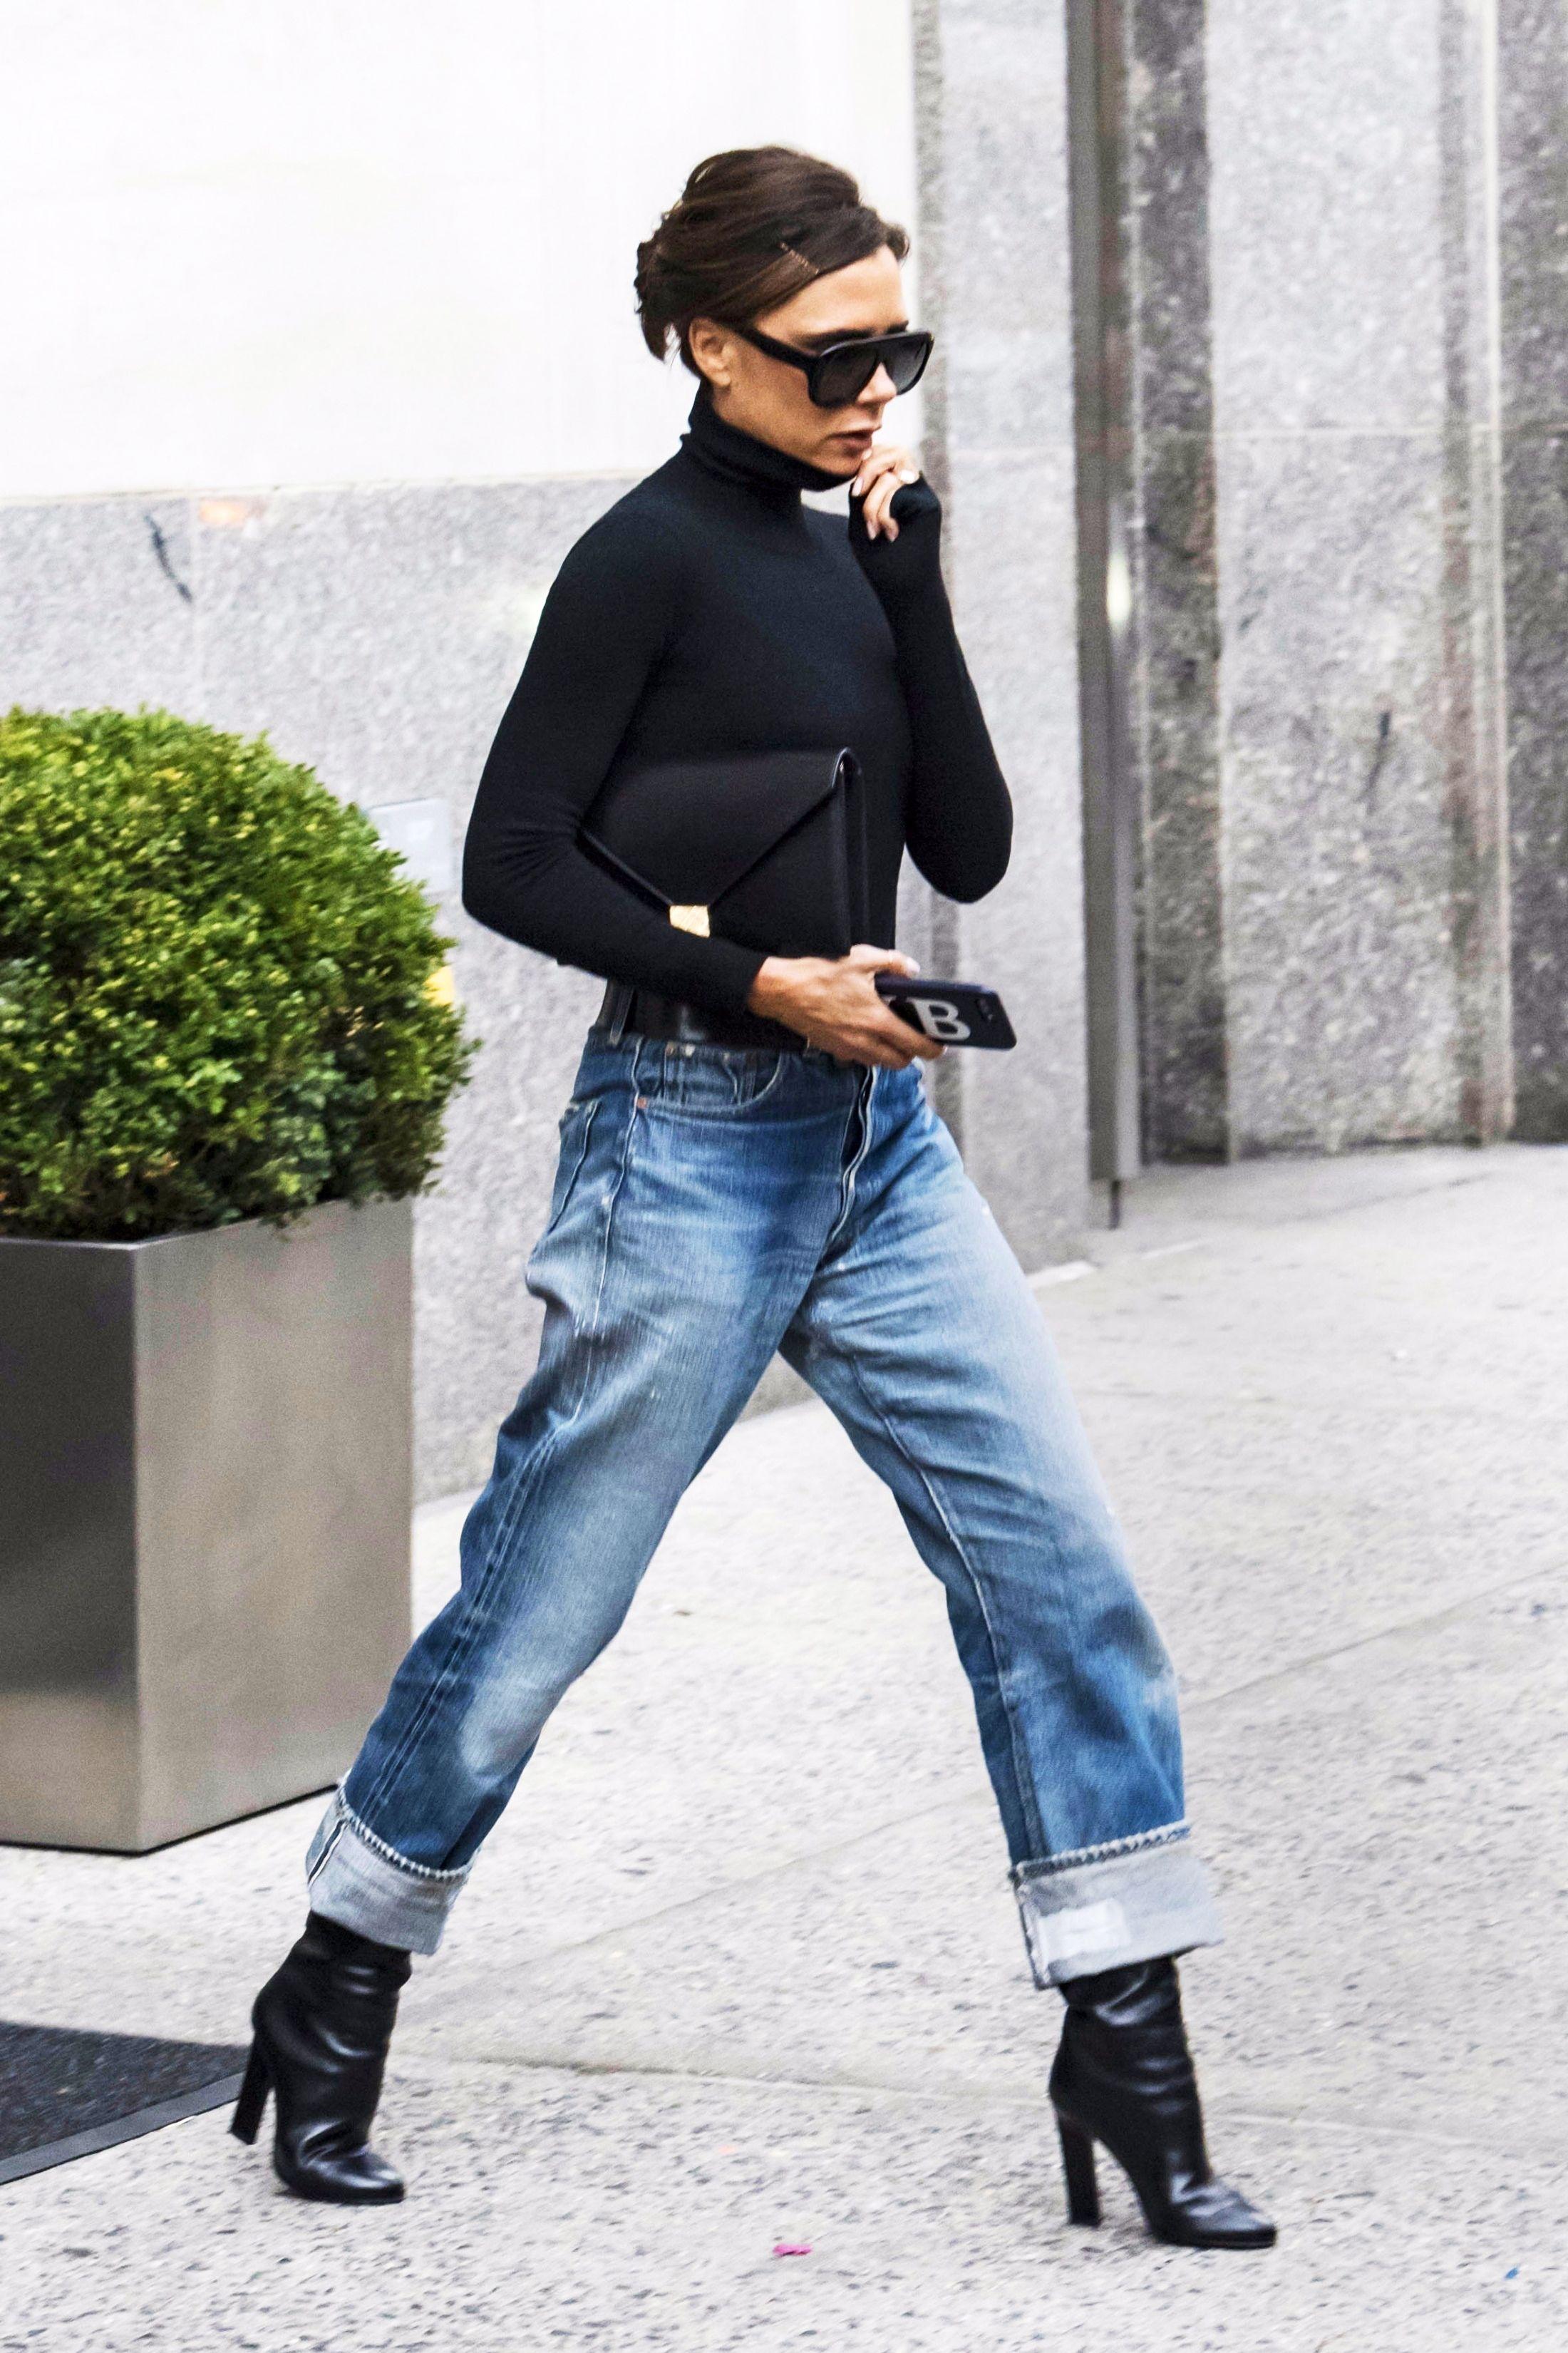 c7dbf9755e Victoria Beckham s Best Fashion Looks - Pictures of Victoria Beckham Style